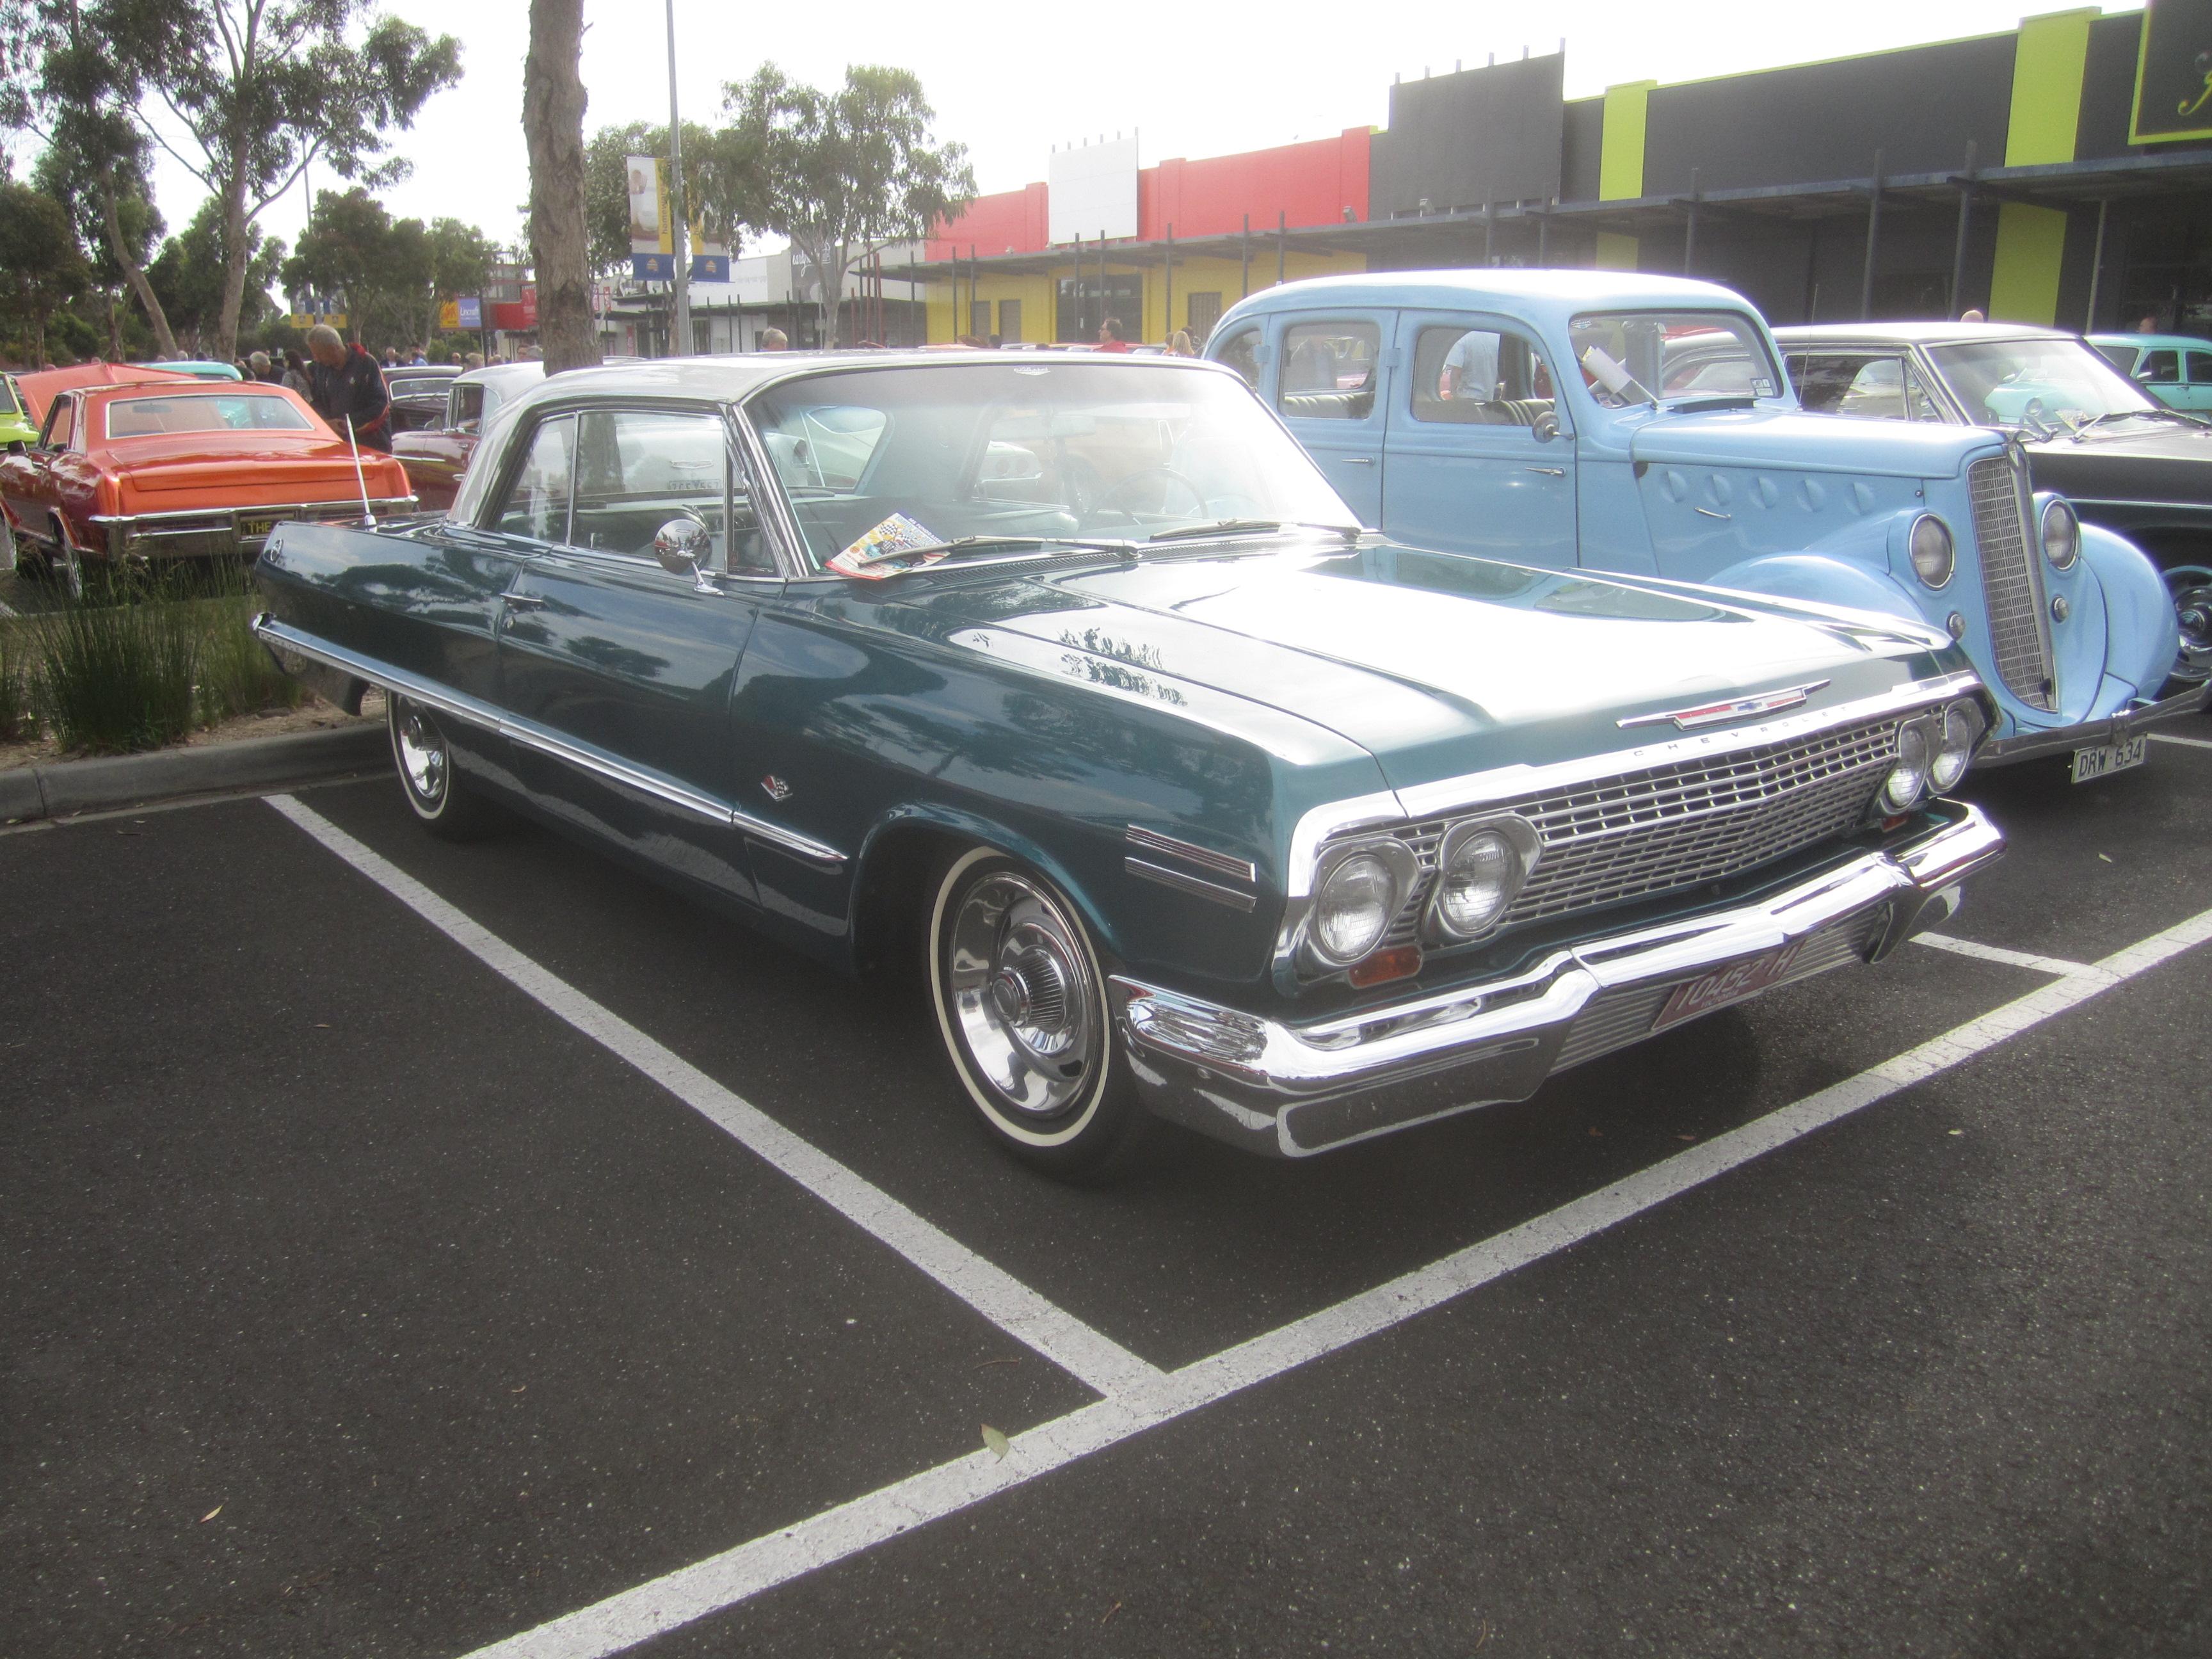 File1963 Chevrolet Impala 2 door Hardtop.jpg & File:1963 Chevrolet Impala 2 door Hardtop.jpg - Wikimedia Commons